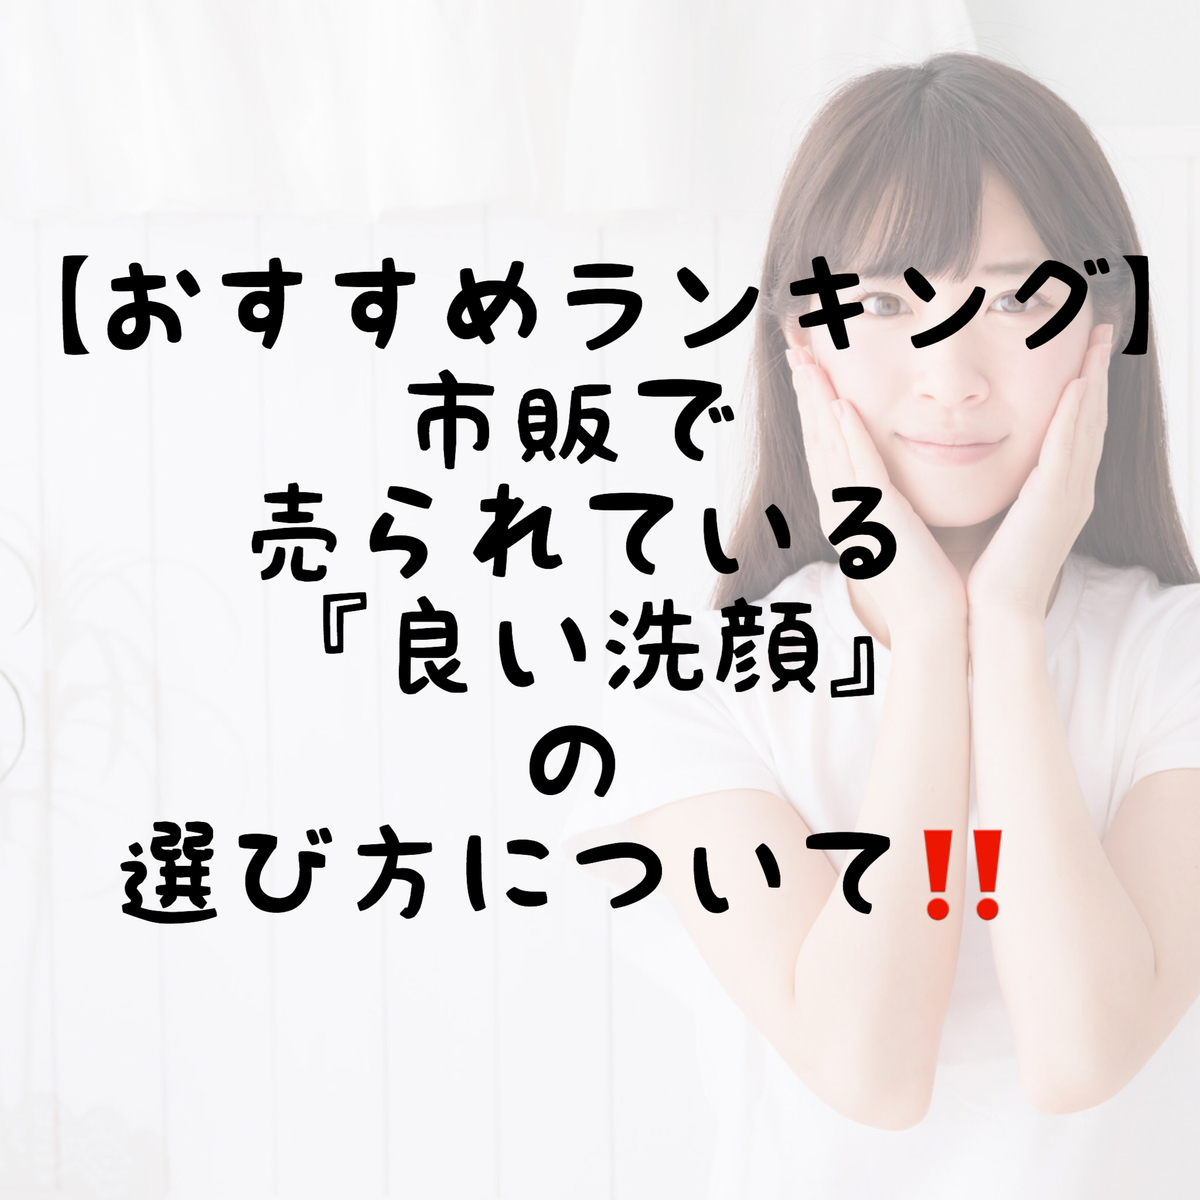 f:id:nokonoko_o:20200728155107j:plain